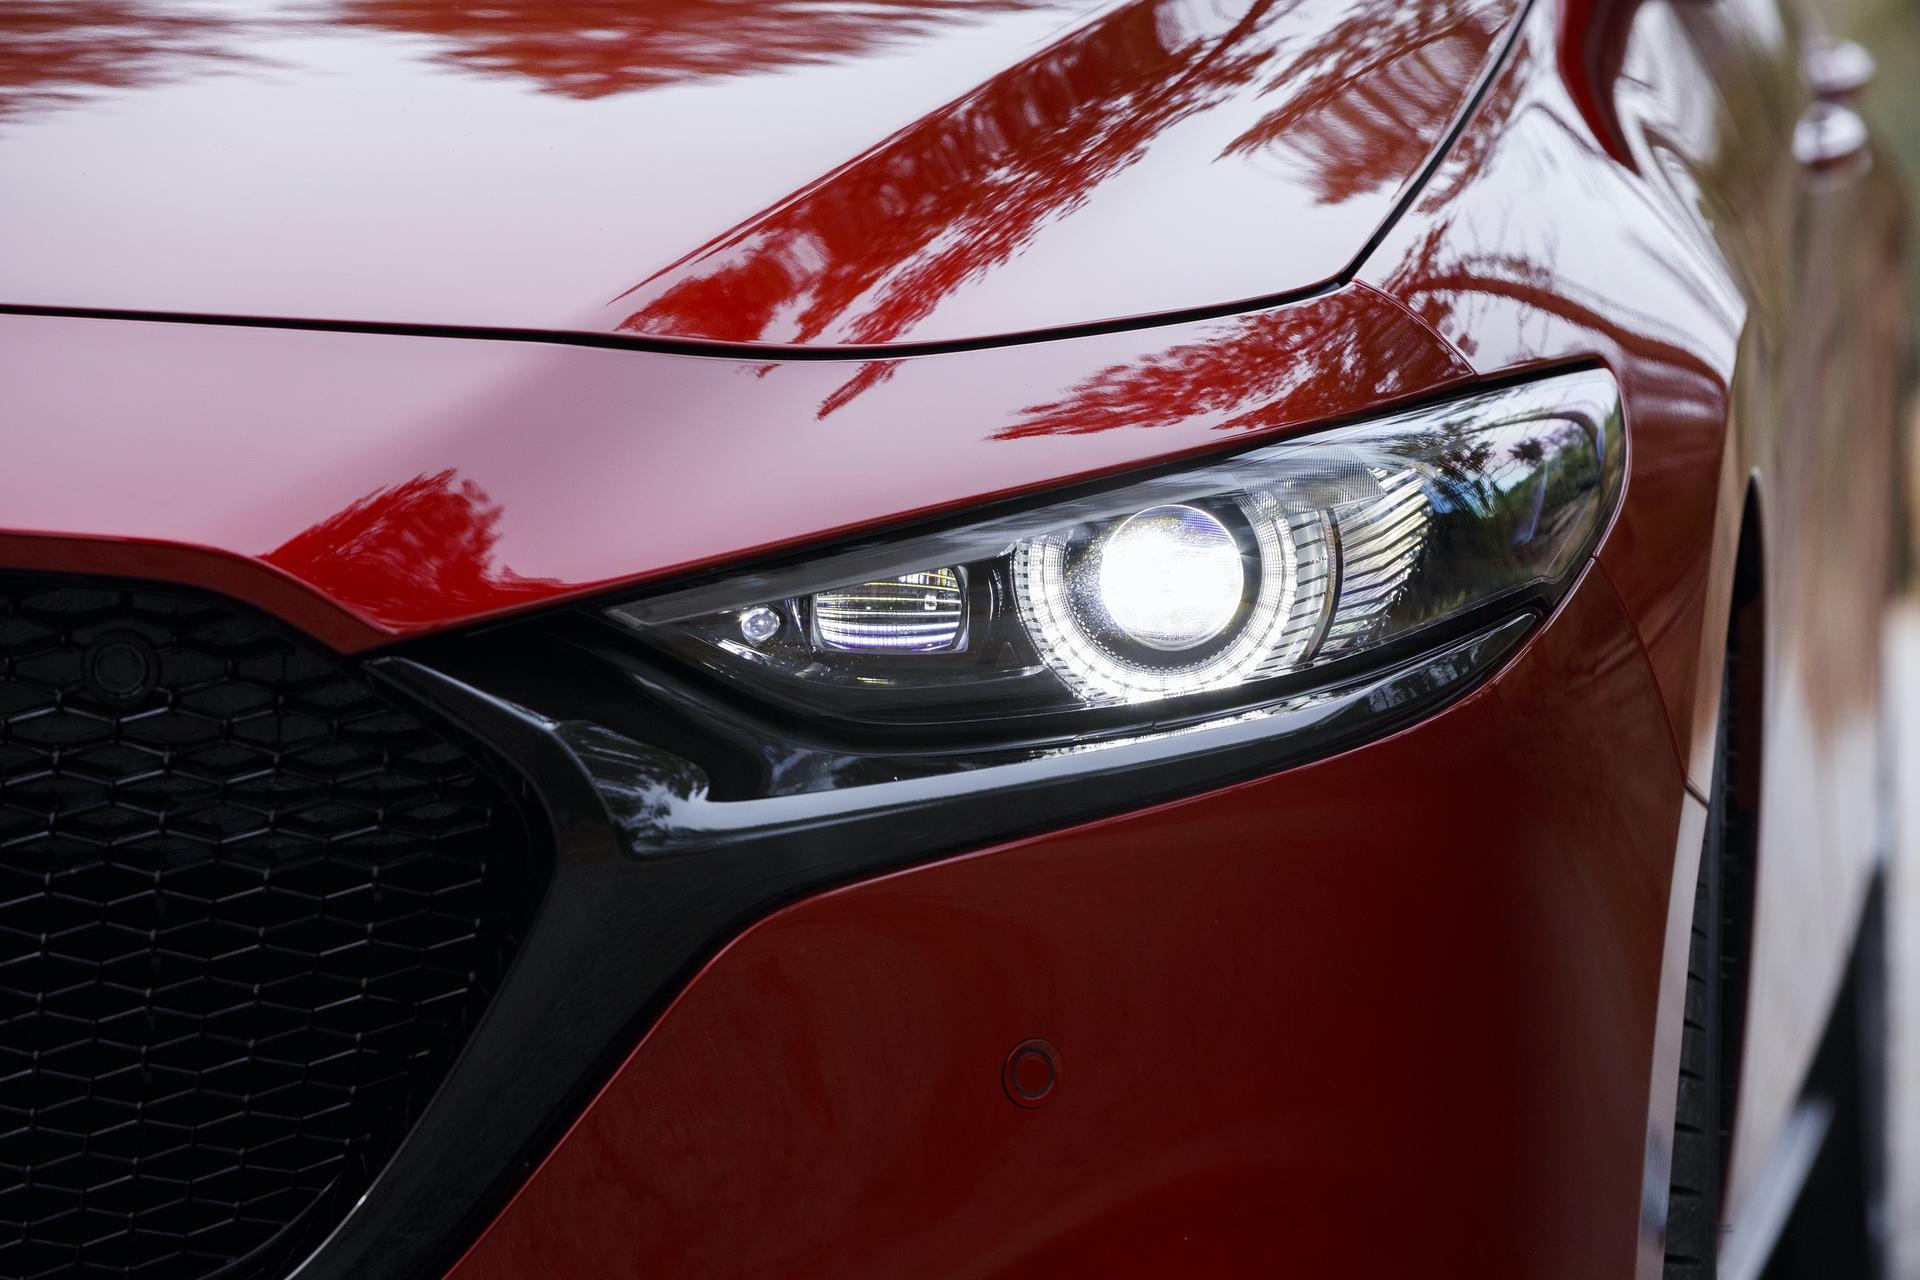 2019-Mazda3-Hatchback_17